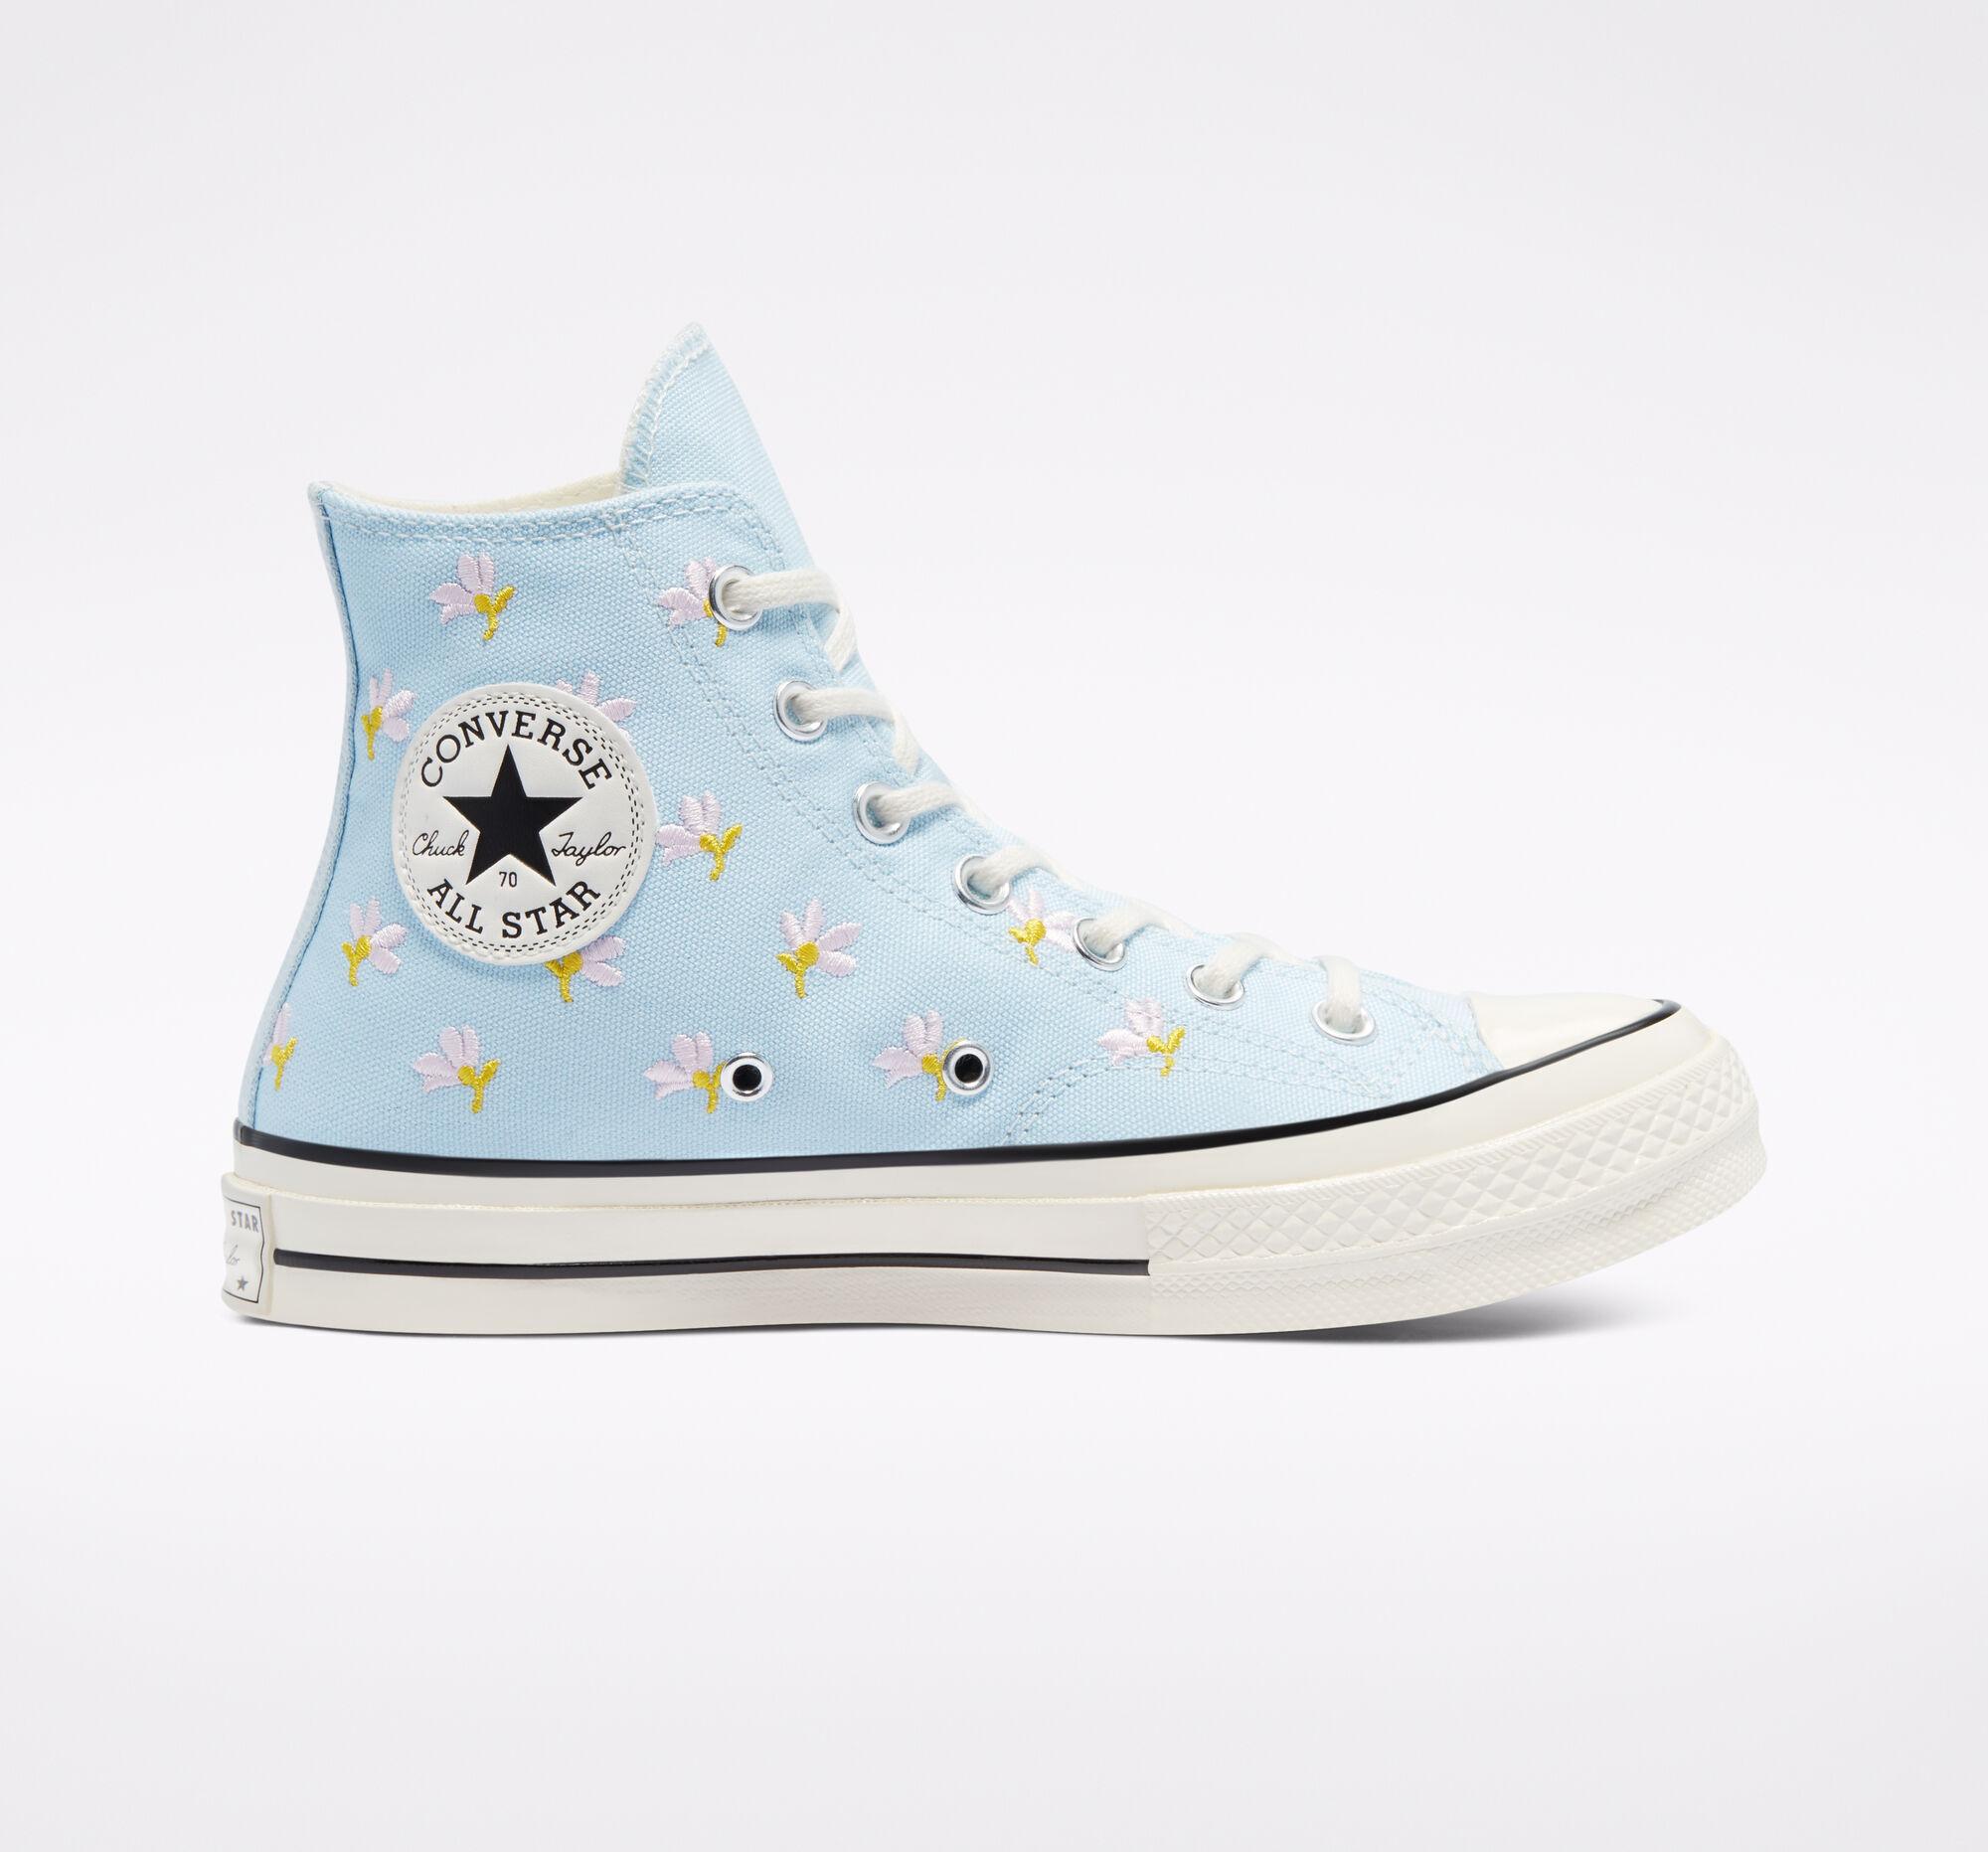 Converse:夏季大促開啟 新款5折起 ¥336收撞色高幫帆布鞋